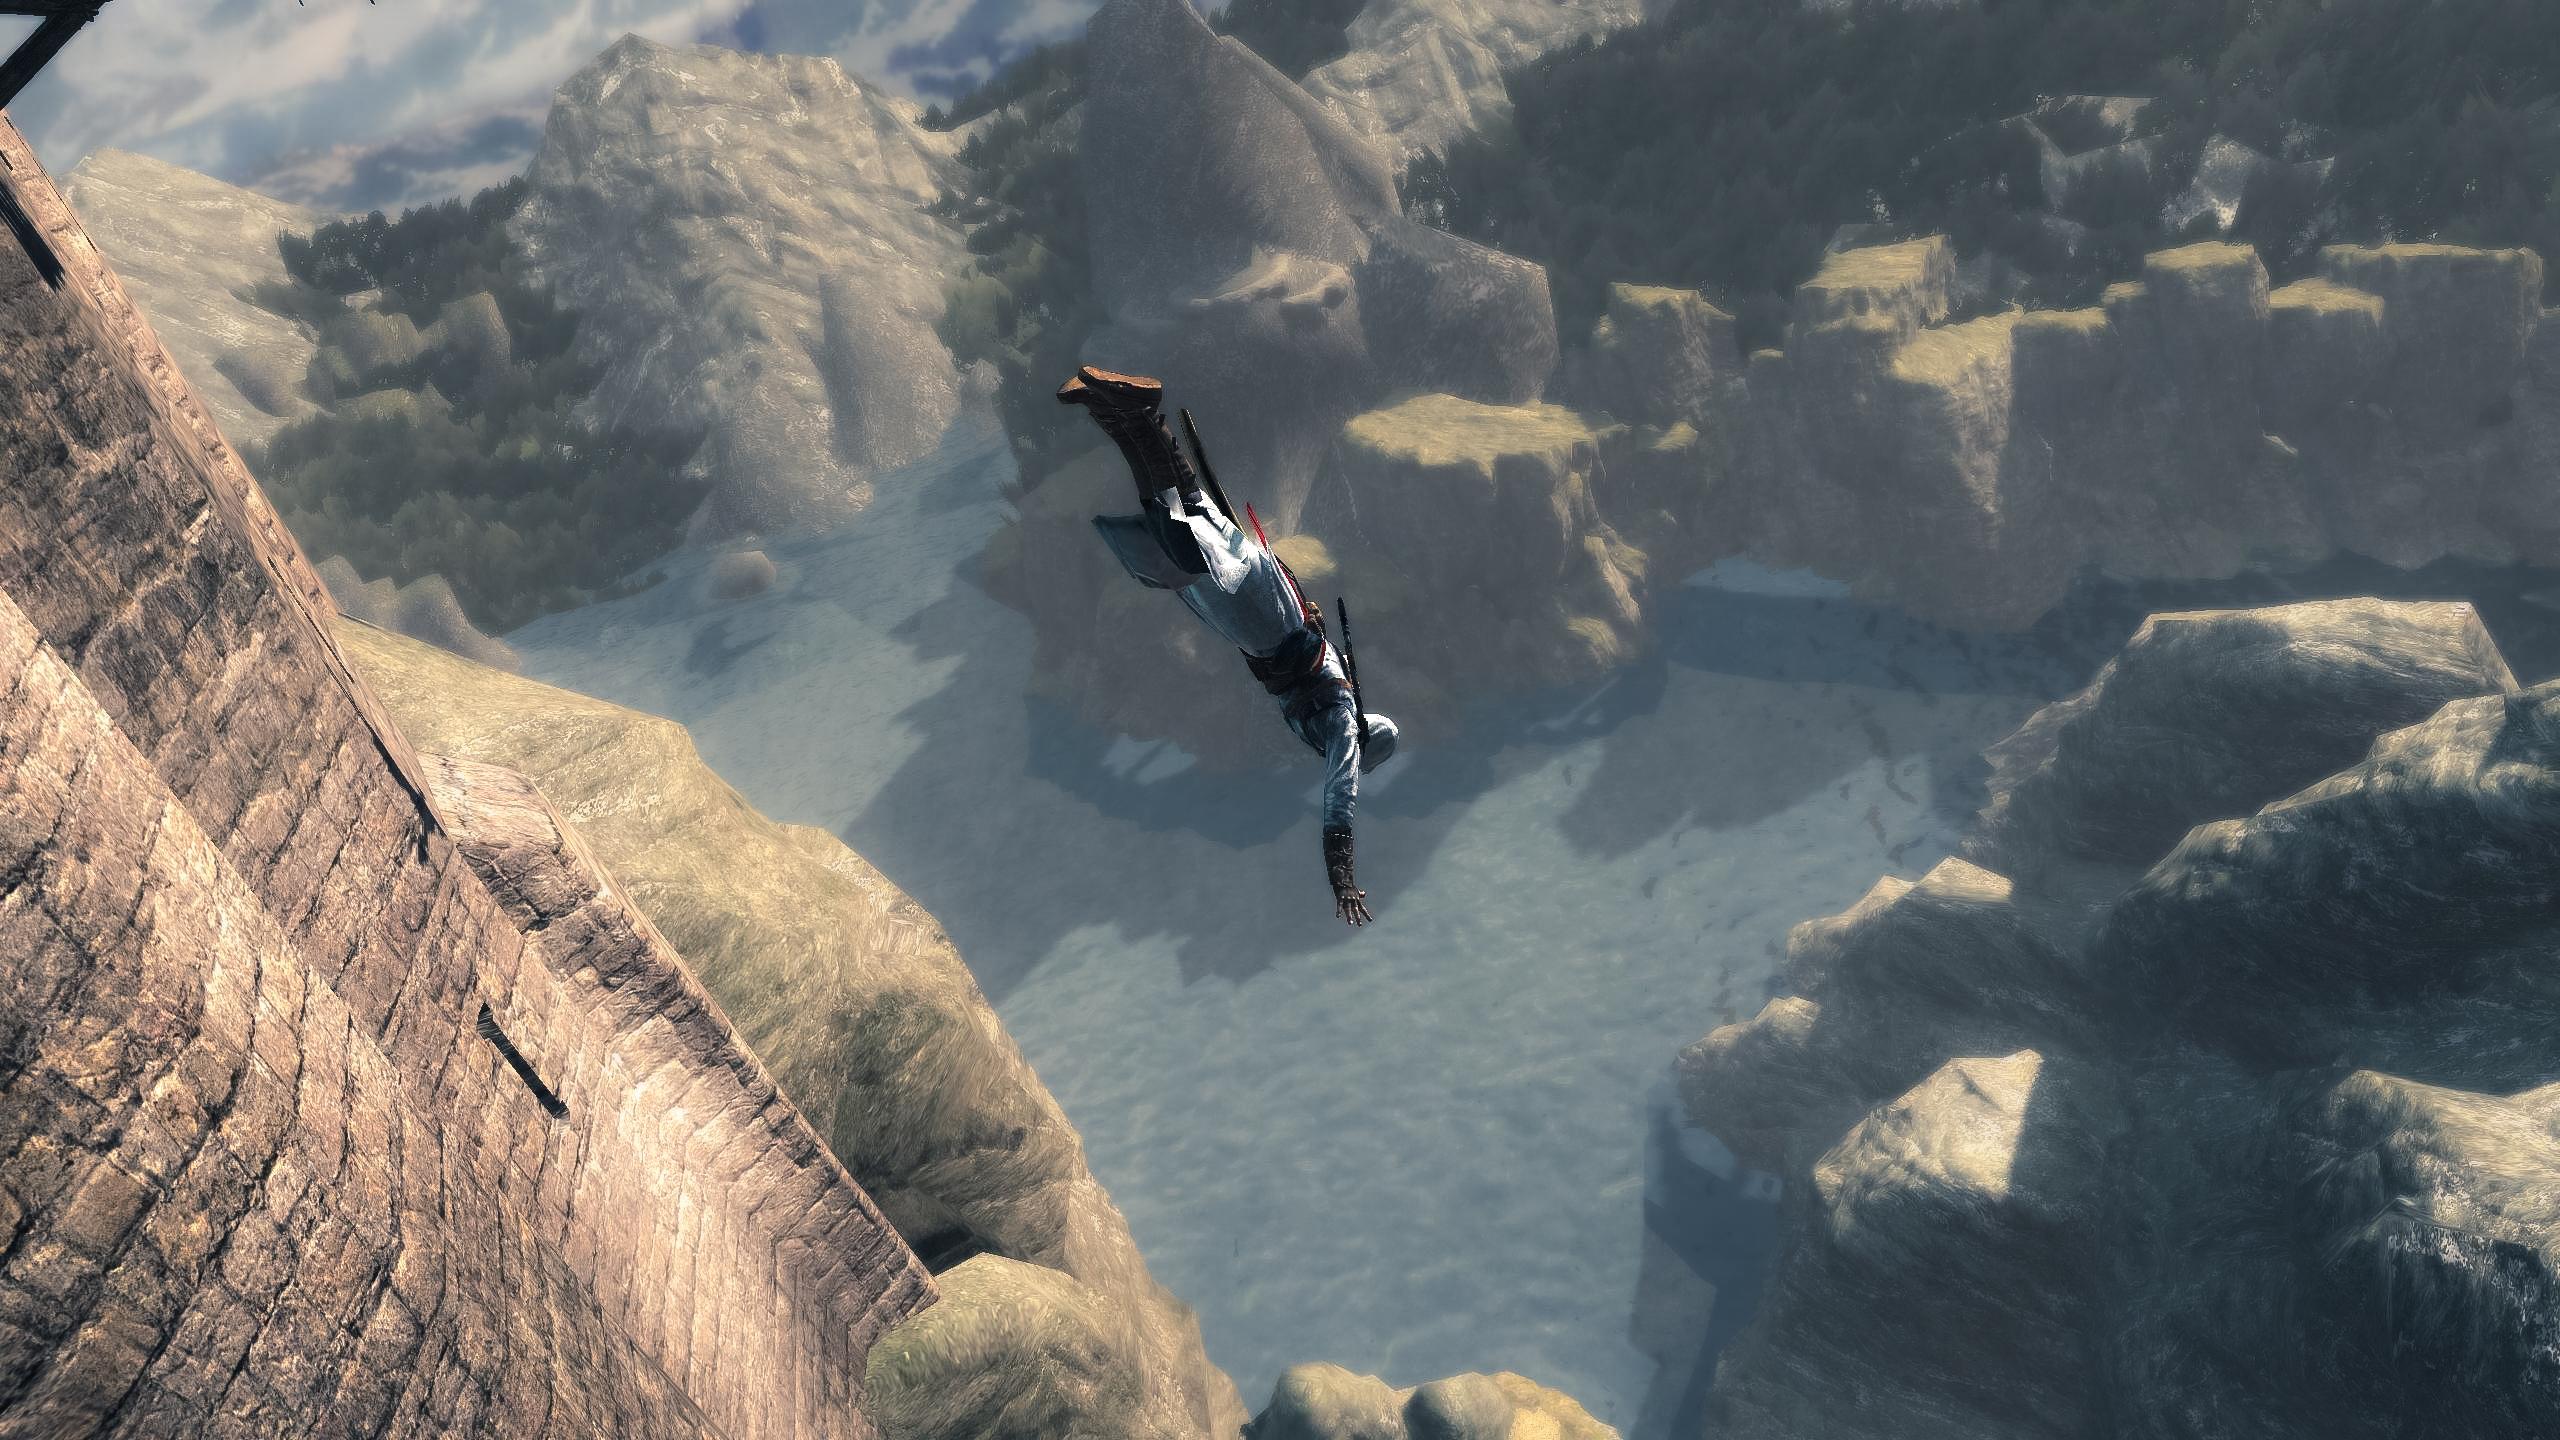 Assassin S Creed Leap Of Faith By Wolfleben On Deviantart